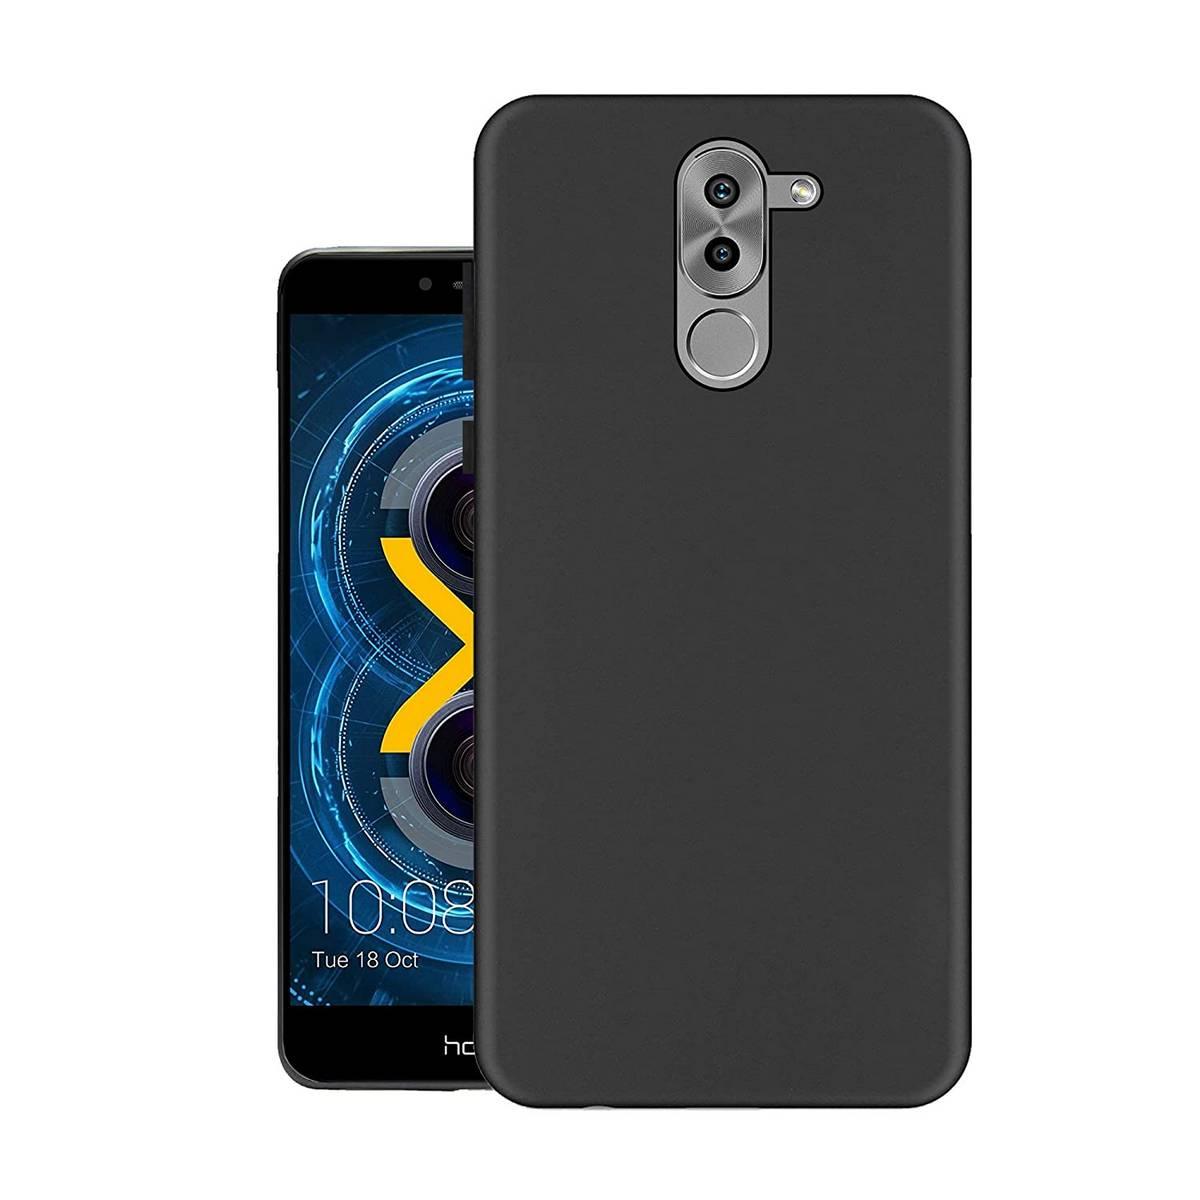 Huawei Honor 6x MATTE BLACK FLEXIBLE TPU CASE SLIM COVER - SHOCKPROOF